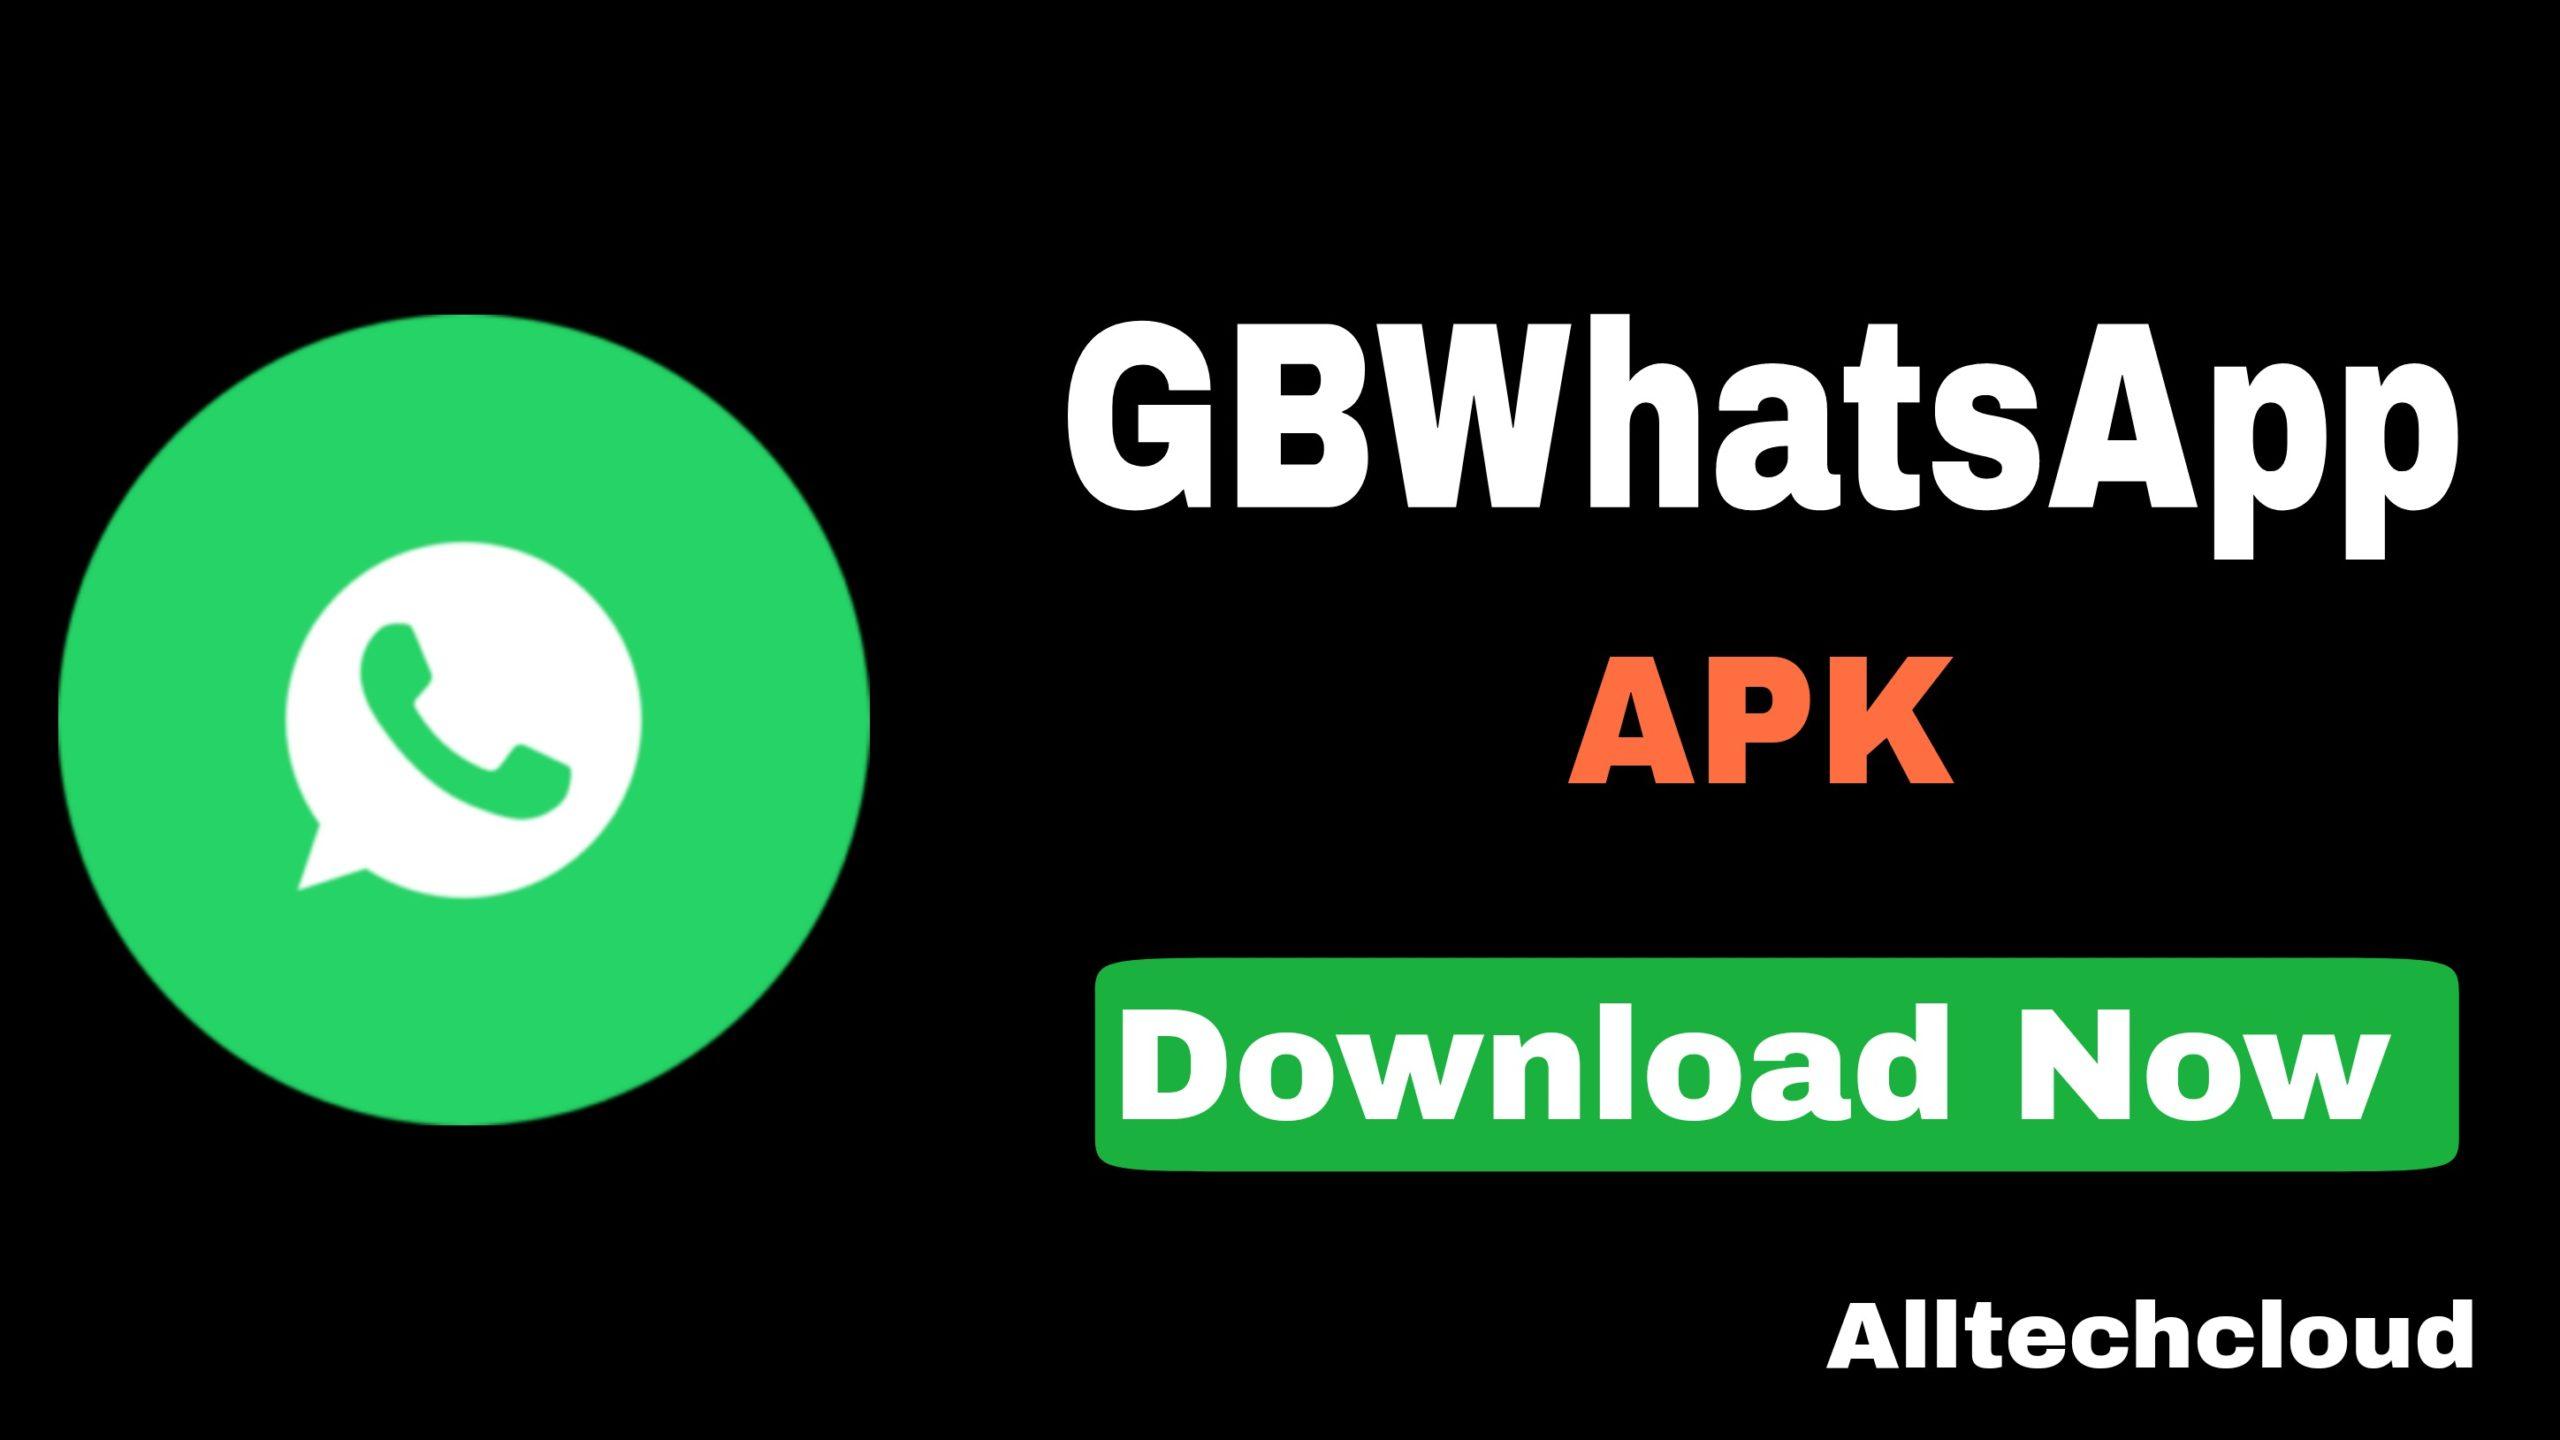 GBWhatsapp APK Download Latest Version (Anti-Ban) 2021 [Updated]